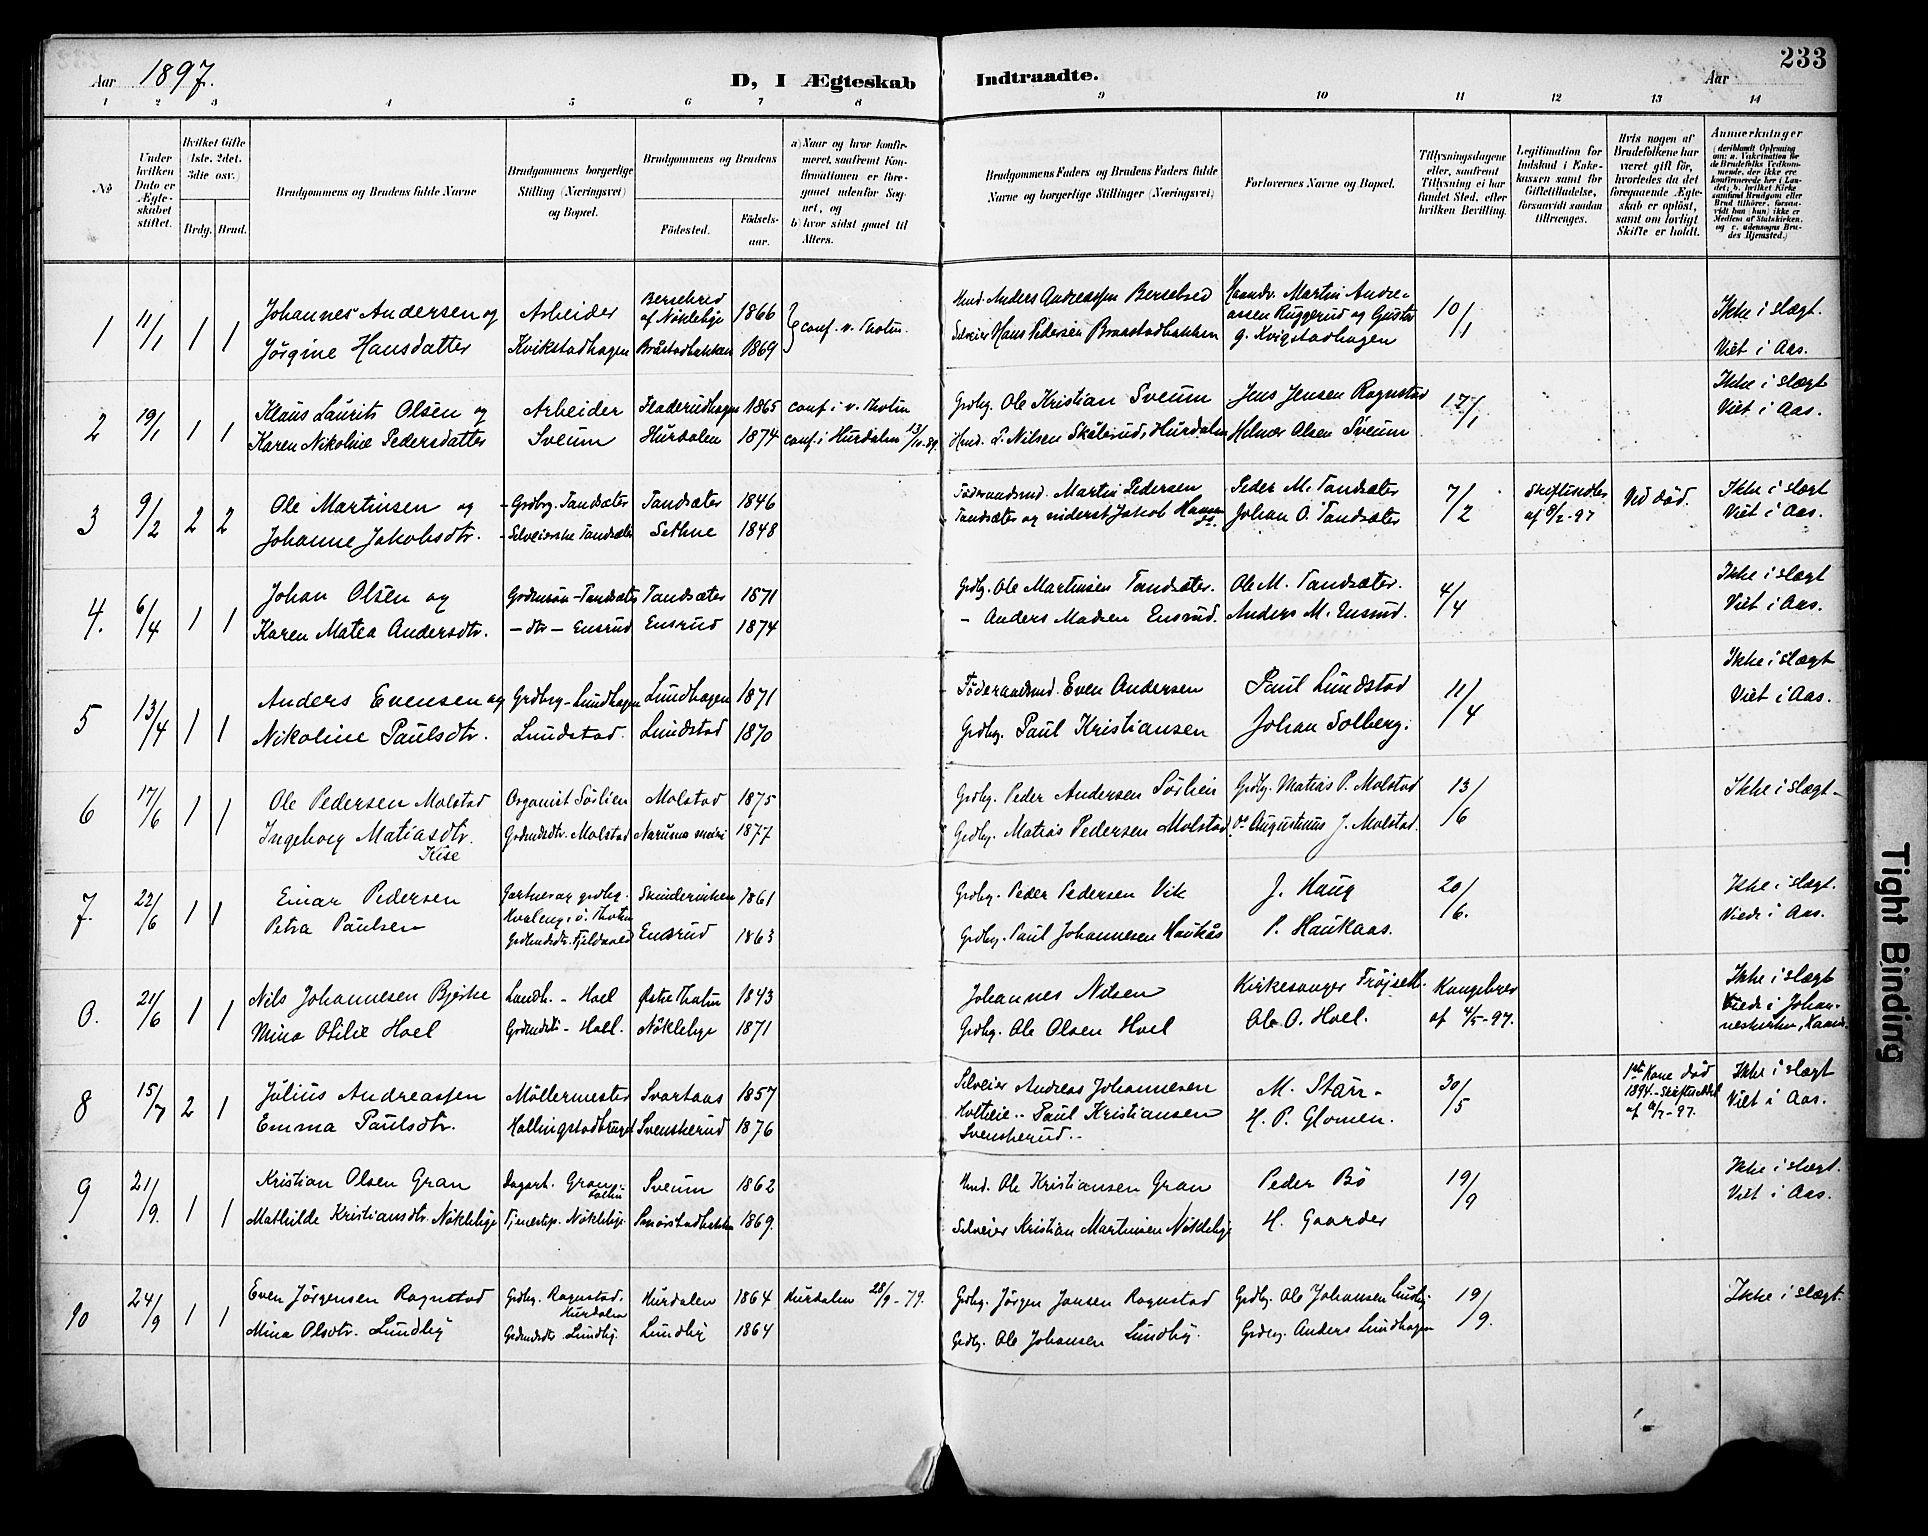 SAH, Vestre Toten prestekontor, H/Ha/Haa/L0013: Parish register (official) no. 13, 1895-1911, p. 233